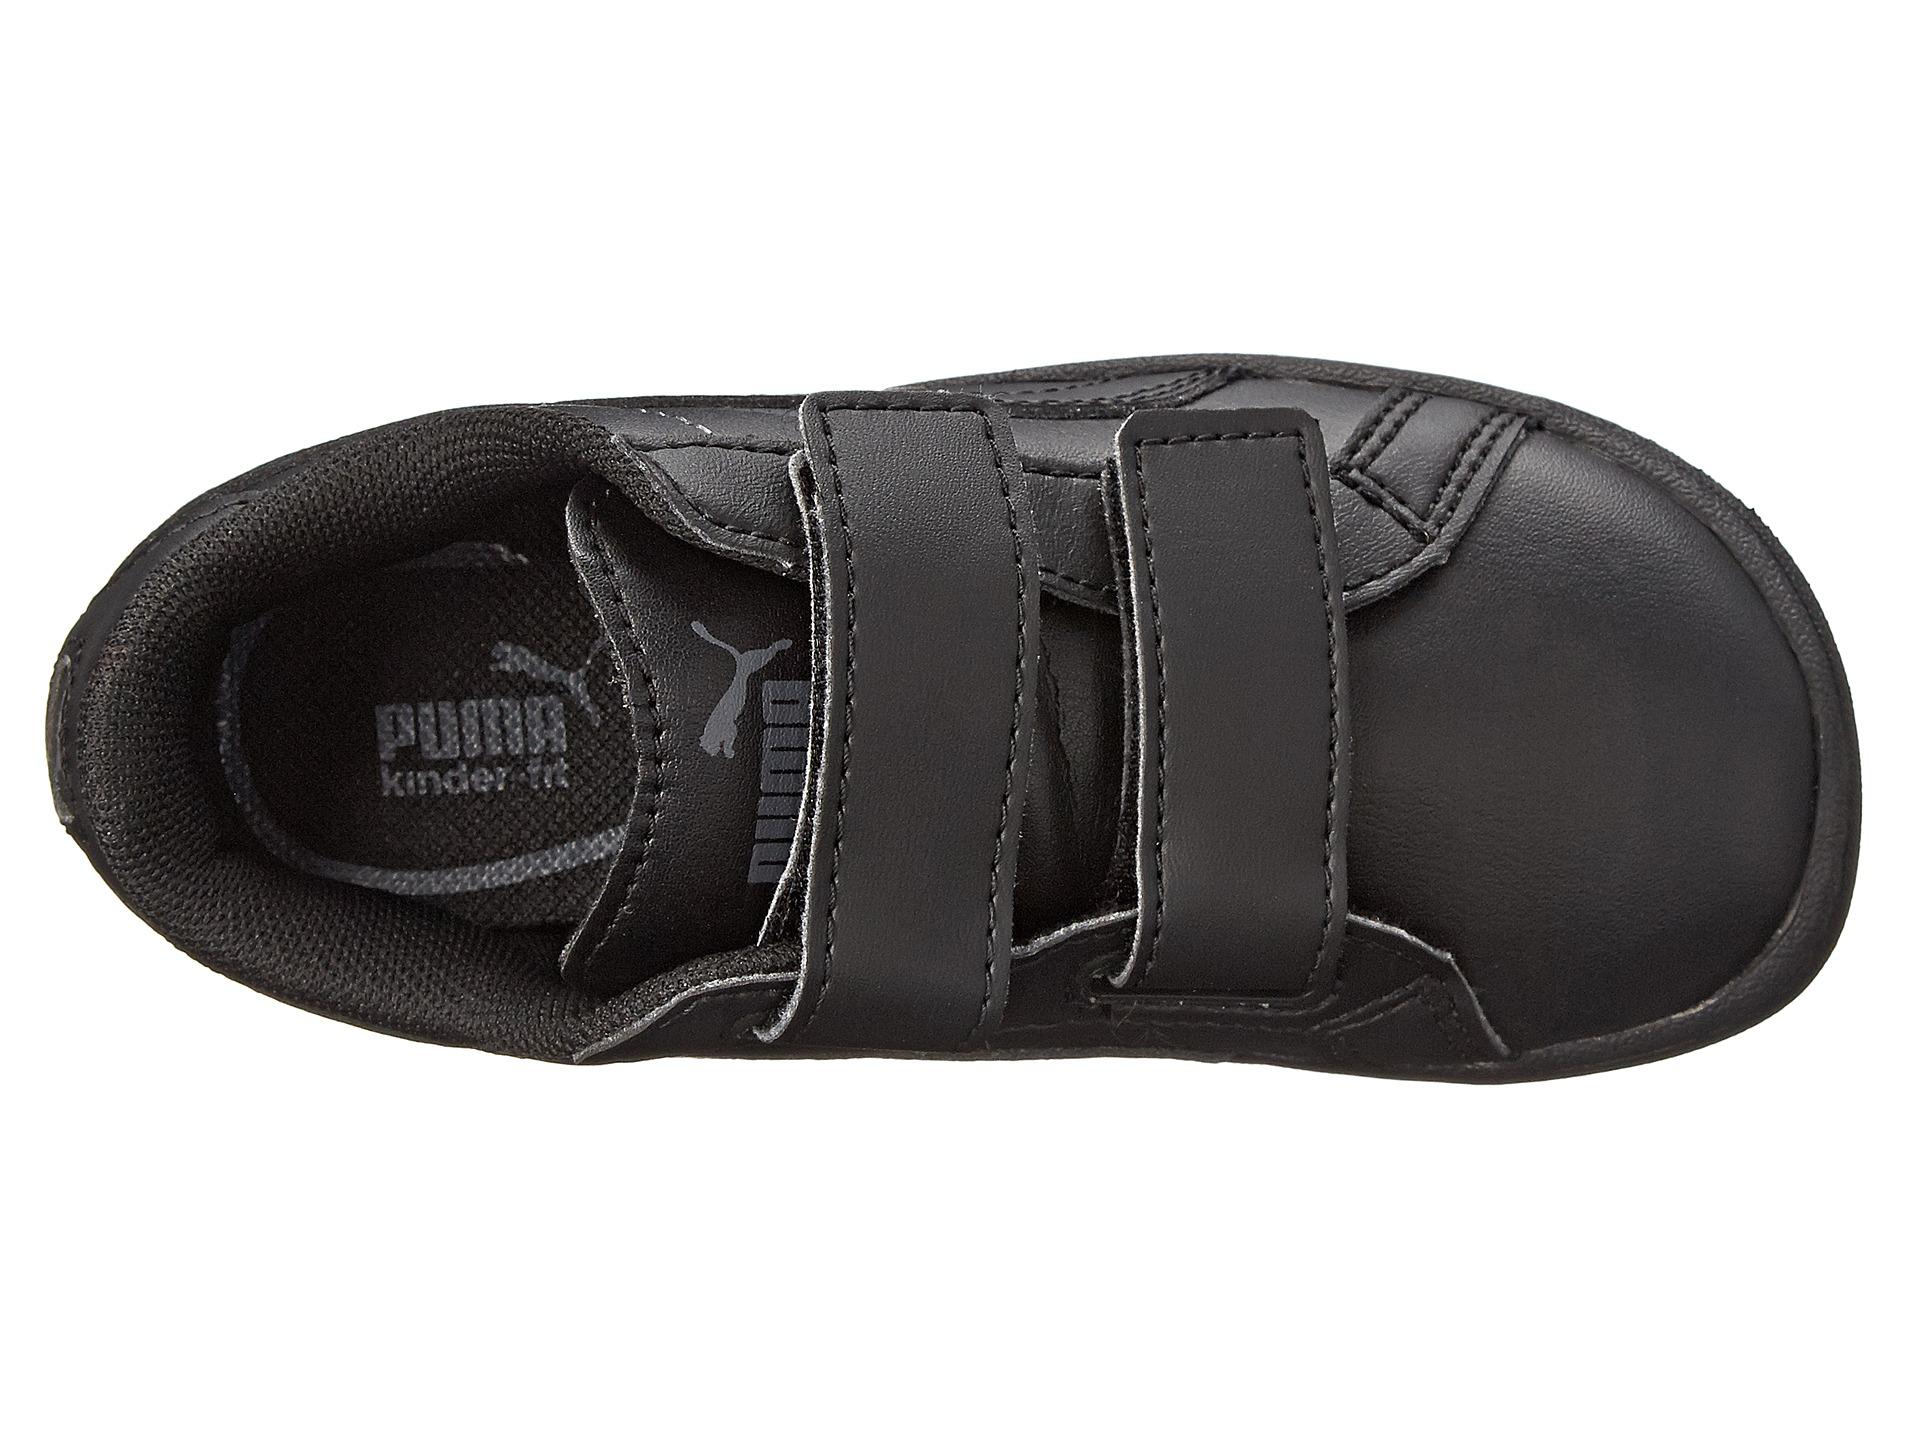 Puma black velcro sandals - Puma Black Velcro Sandals 17